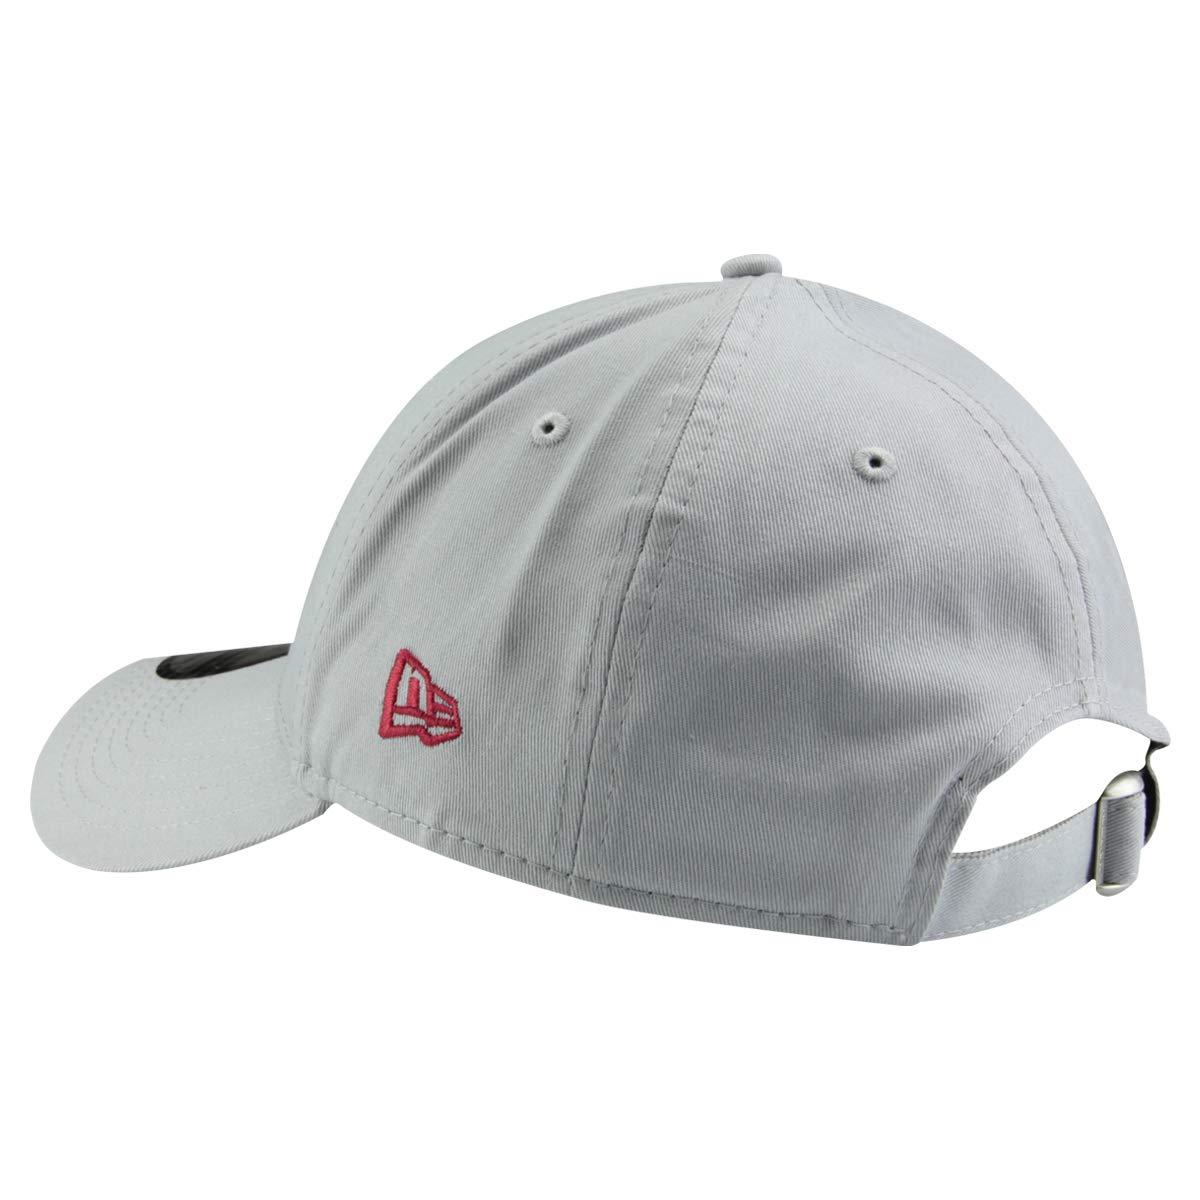 7c72707cf06 ... germany new era 9forty unisex damen herren mlb league essential 940  adjustable capstrapback cap baseball cap